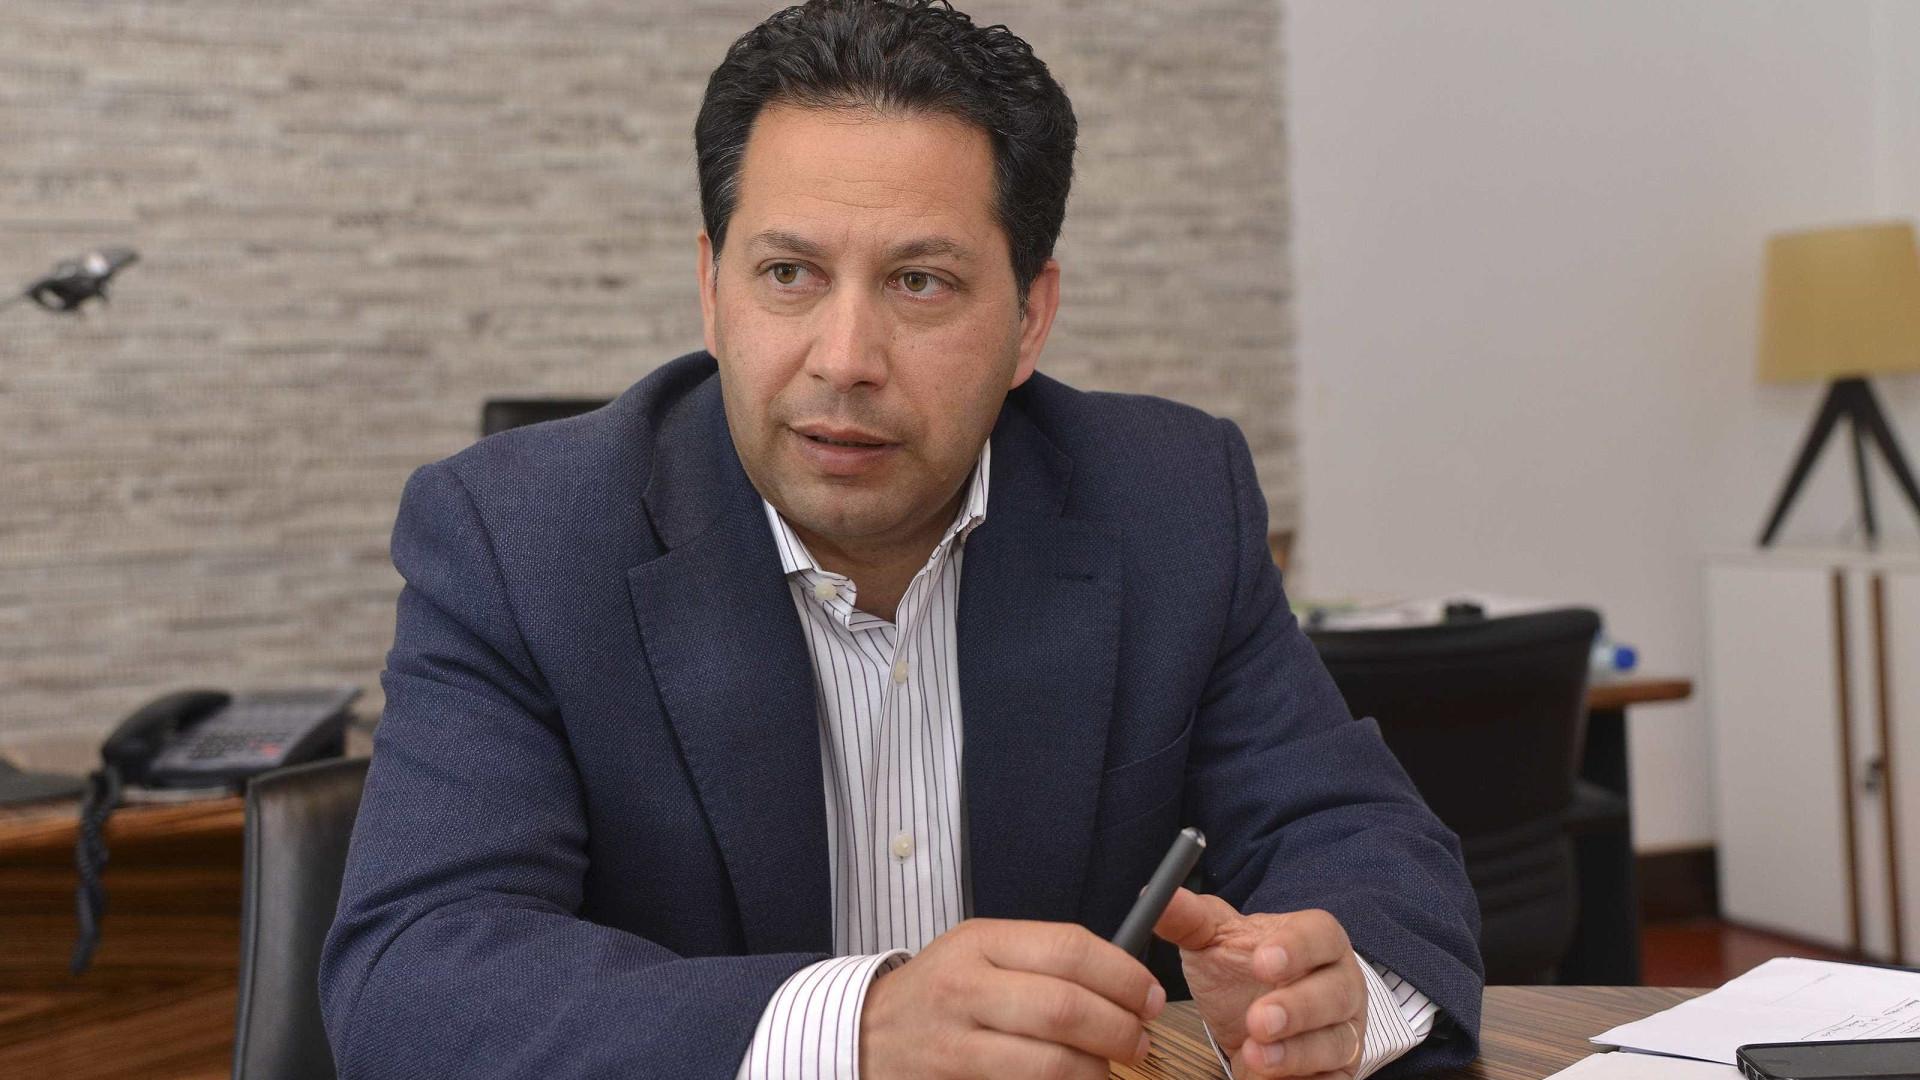 Presidente e vice-presidente da Câmara de Tondela testaram positivo